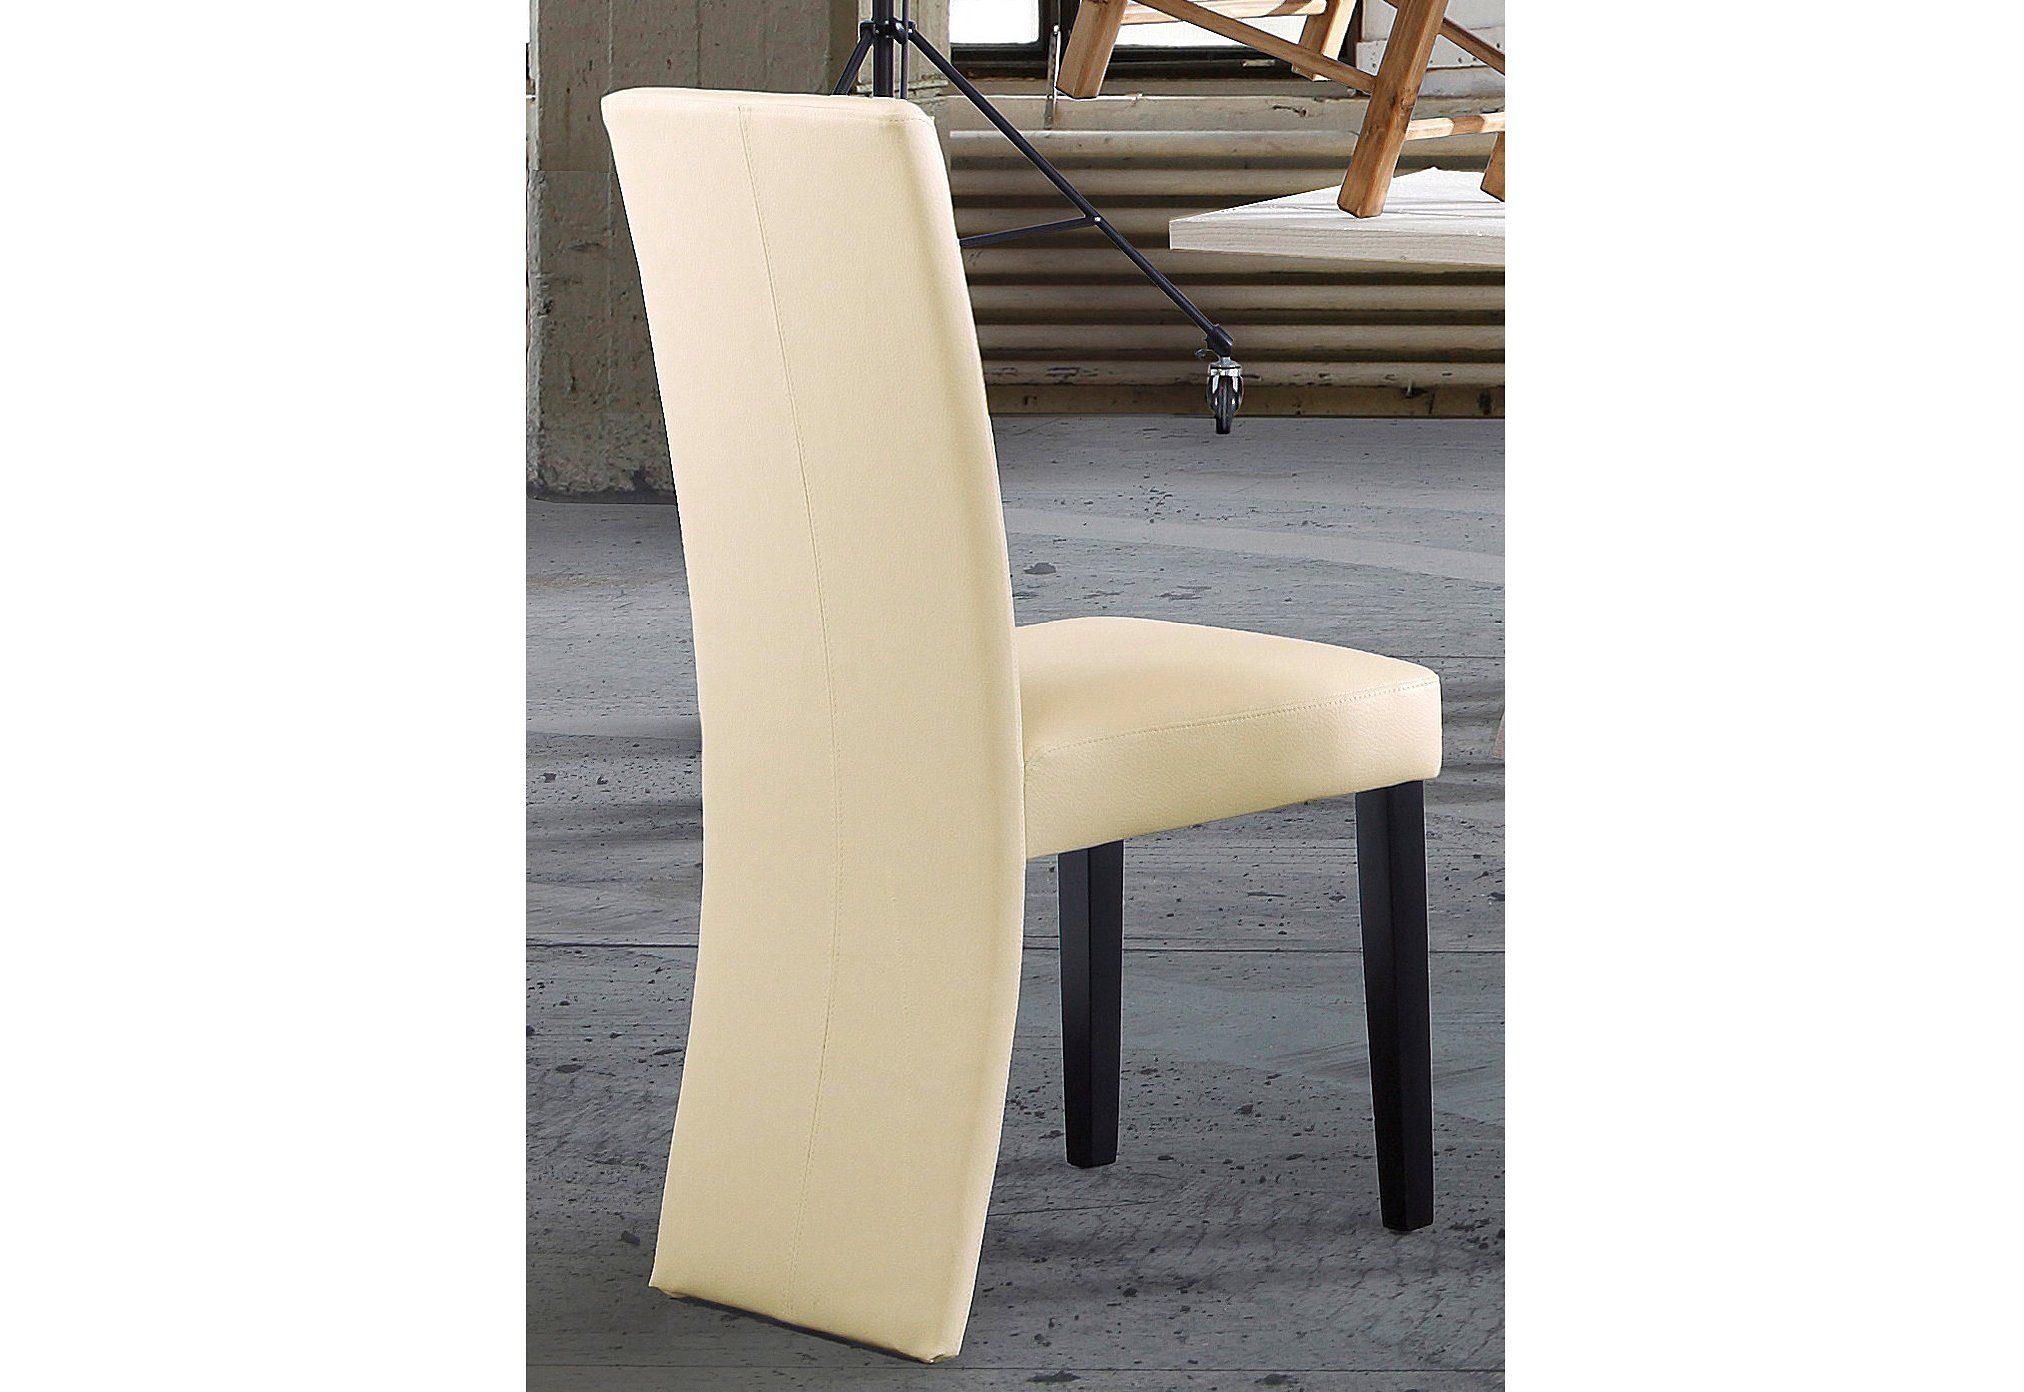 Stühle, SIT, »Stuhlparade«, (2 Stck.)